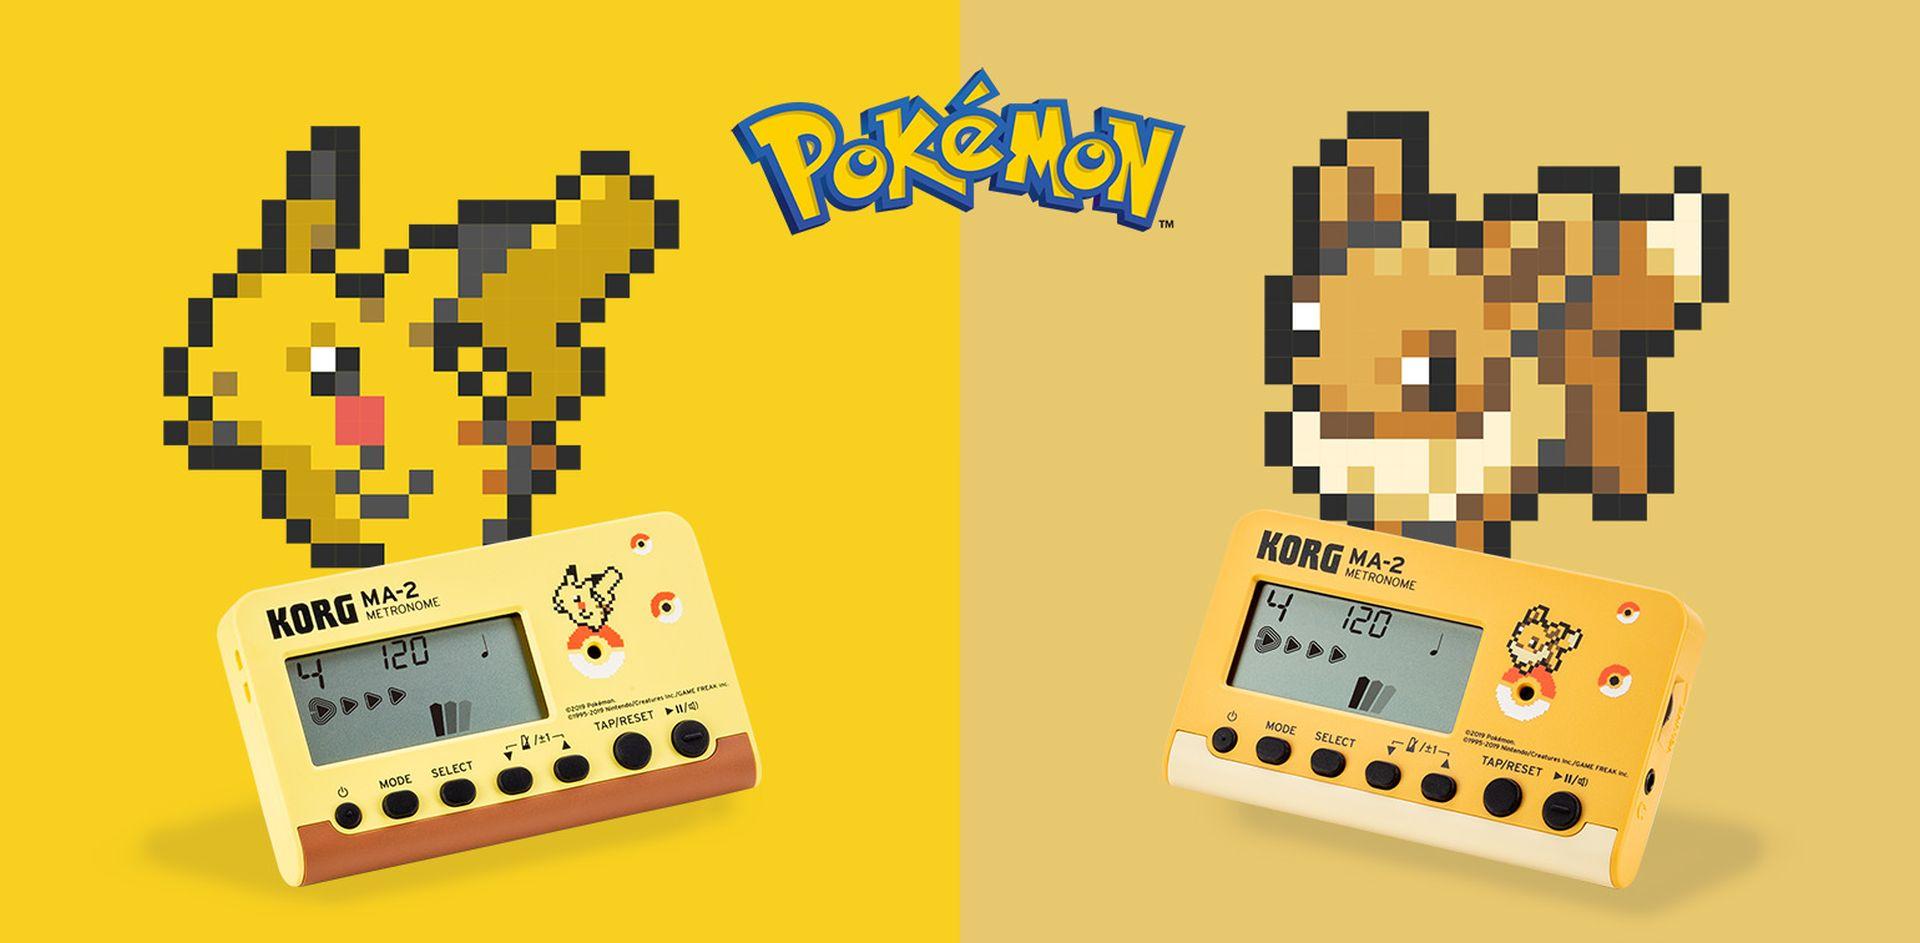 Korg Pokemon